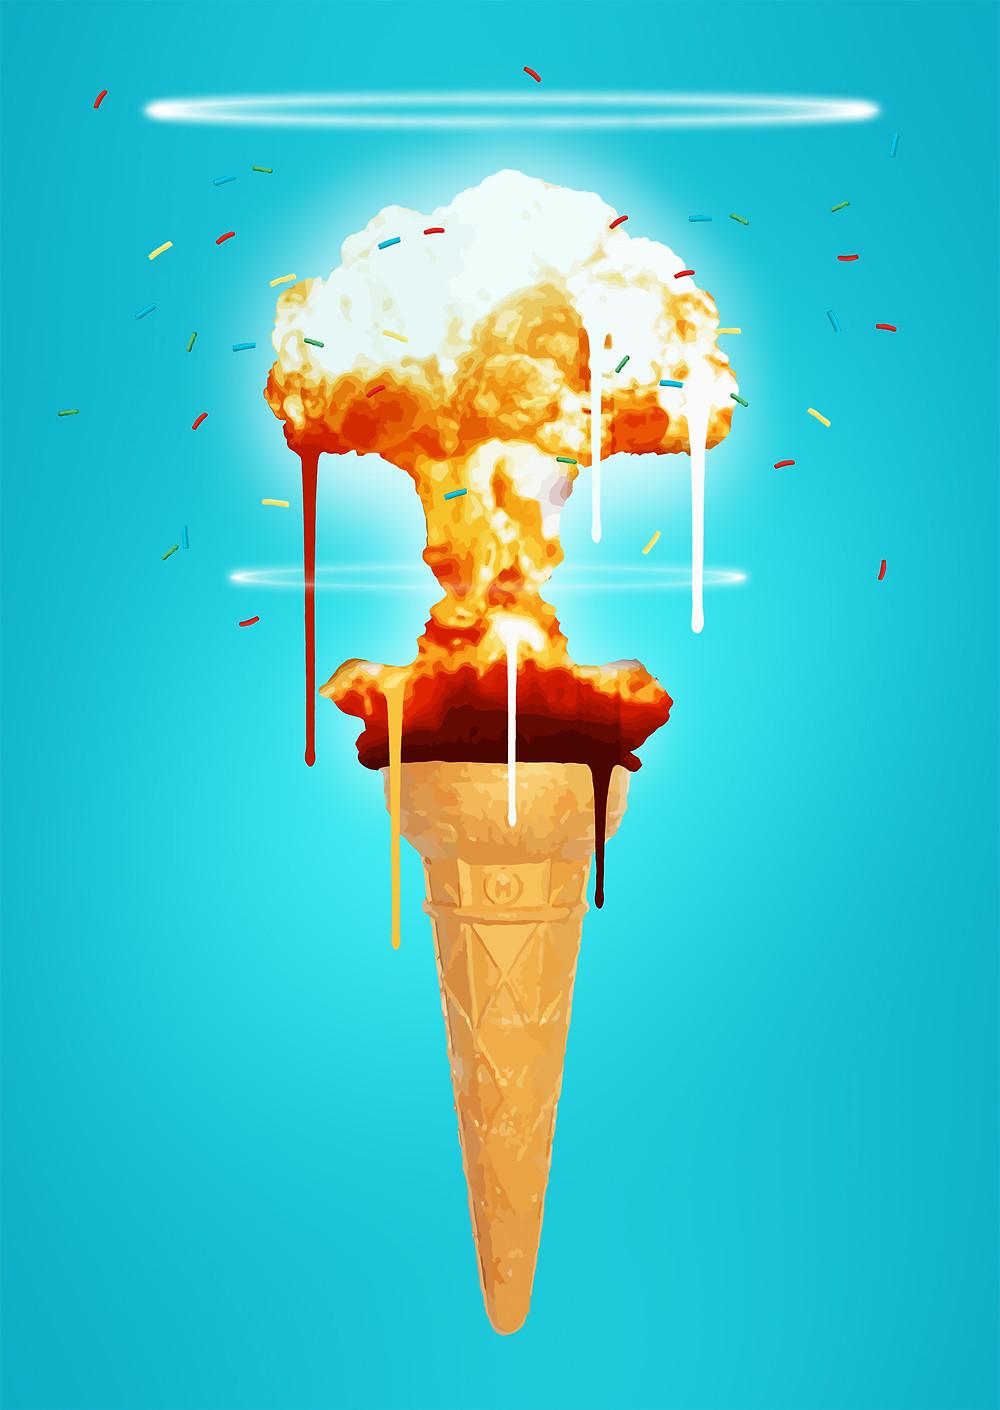 ice cream, meltdown, explosion